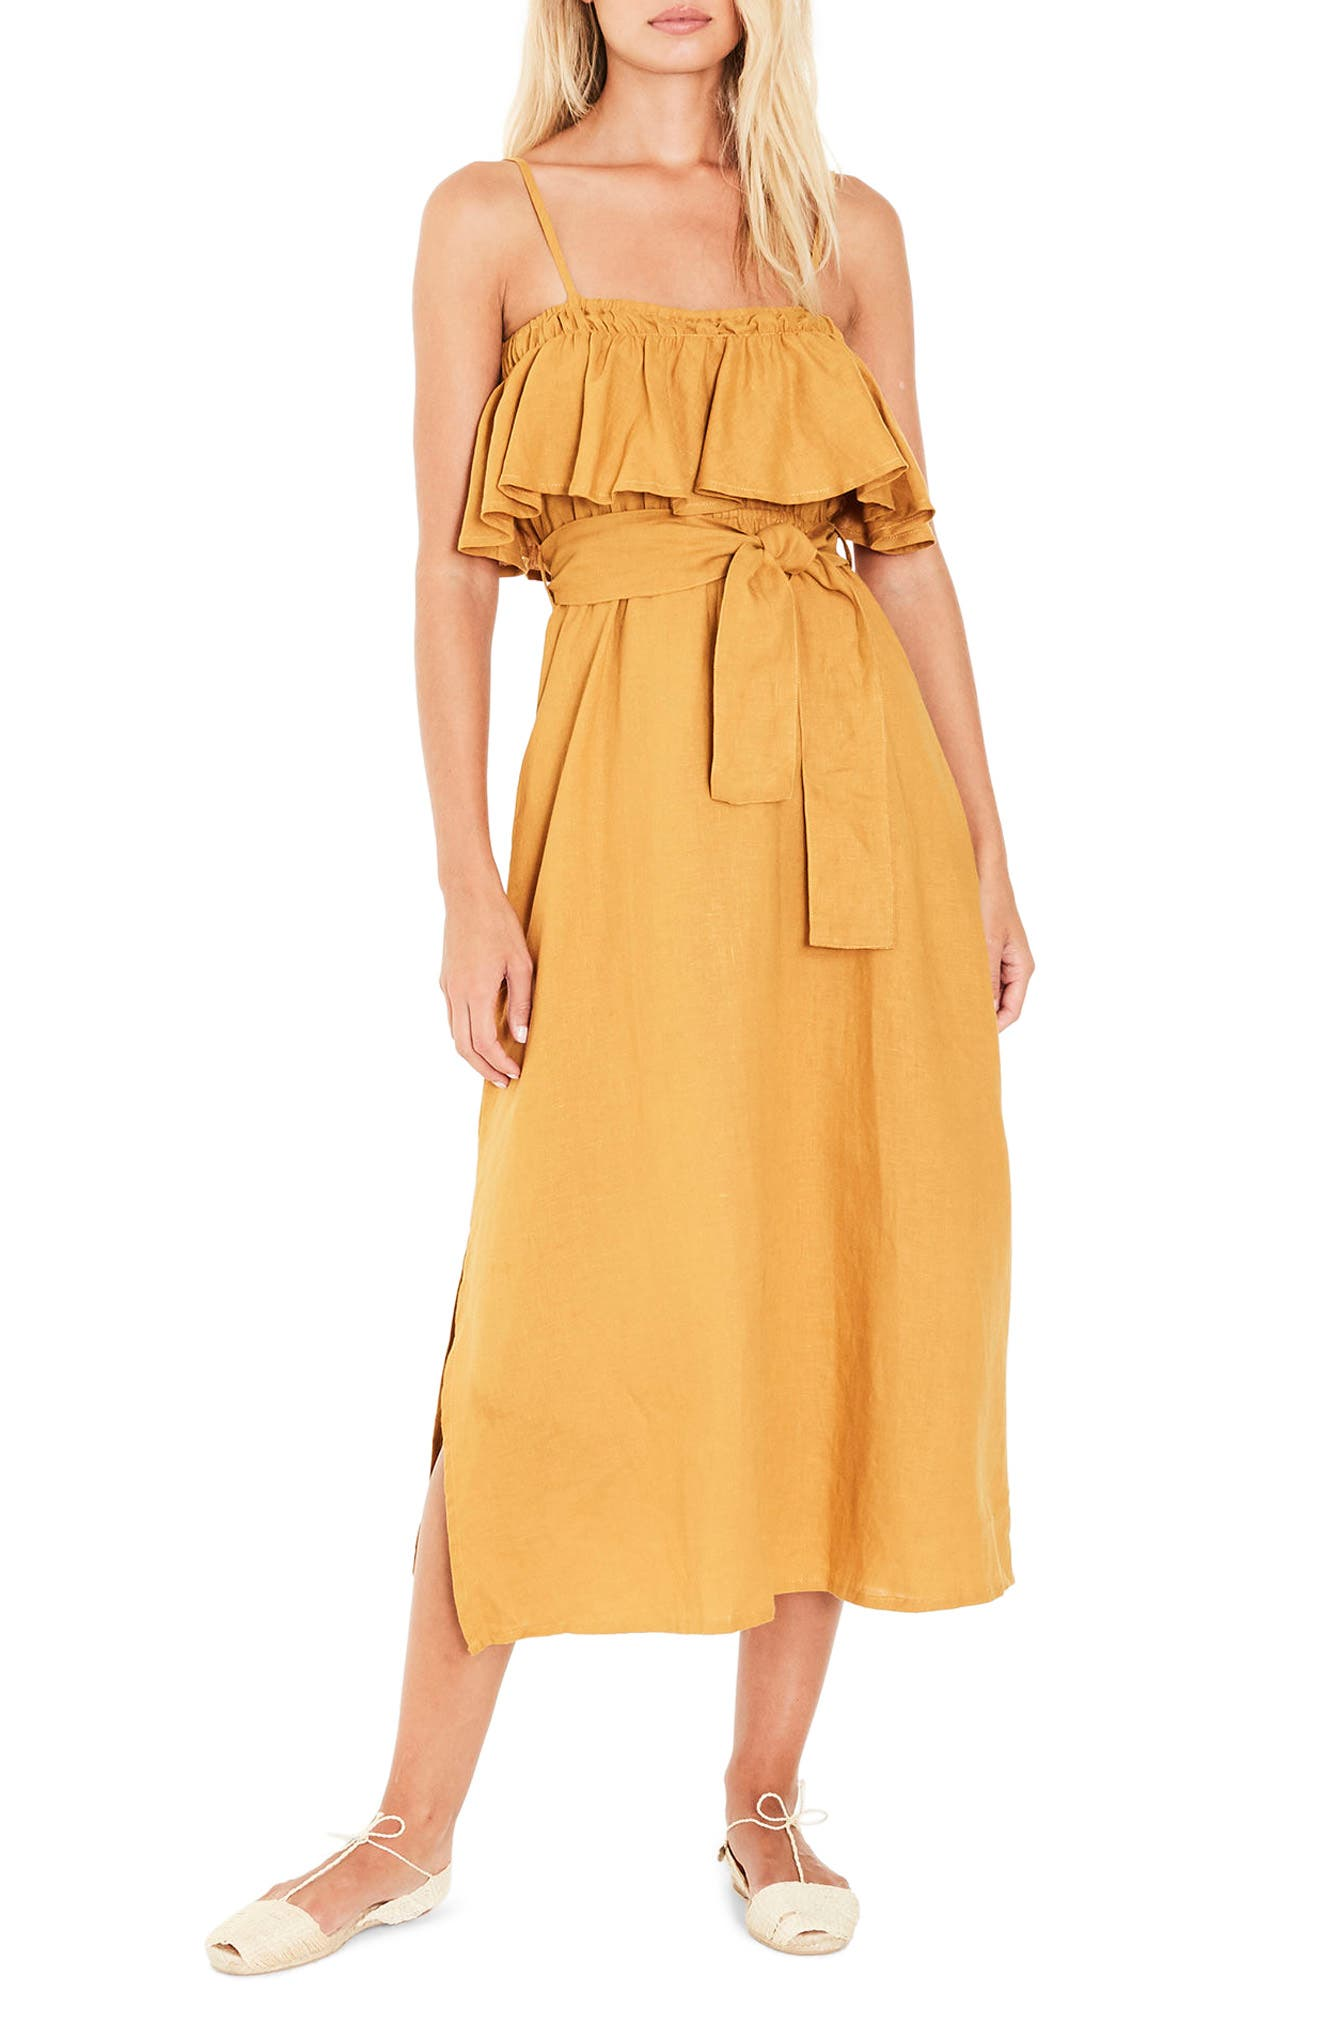 Santo Linen Midi Dress,                             Main thumbnail 1, color,                             Plain Marigold